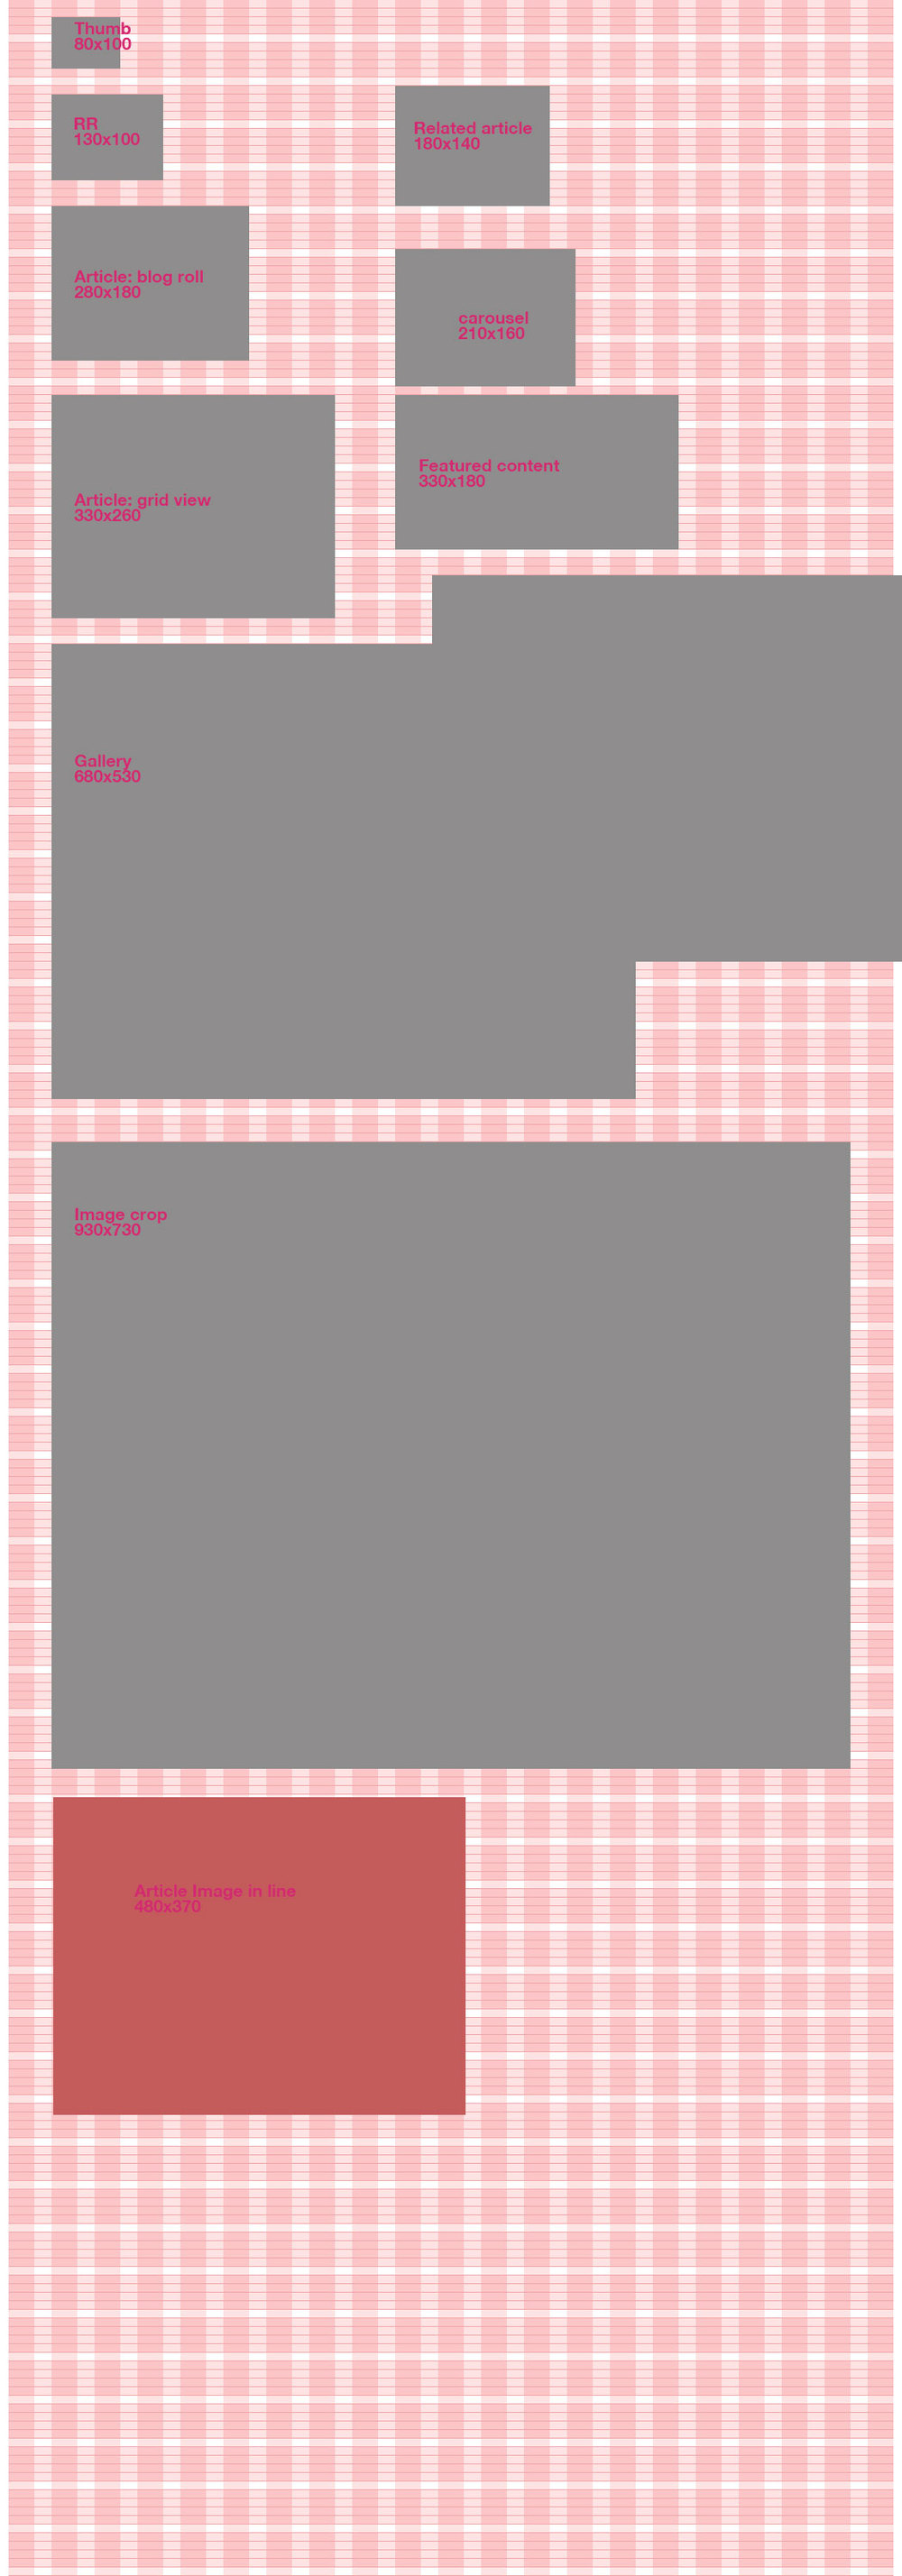 boxsizes_1050.jpg